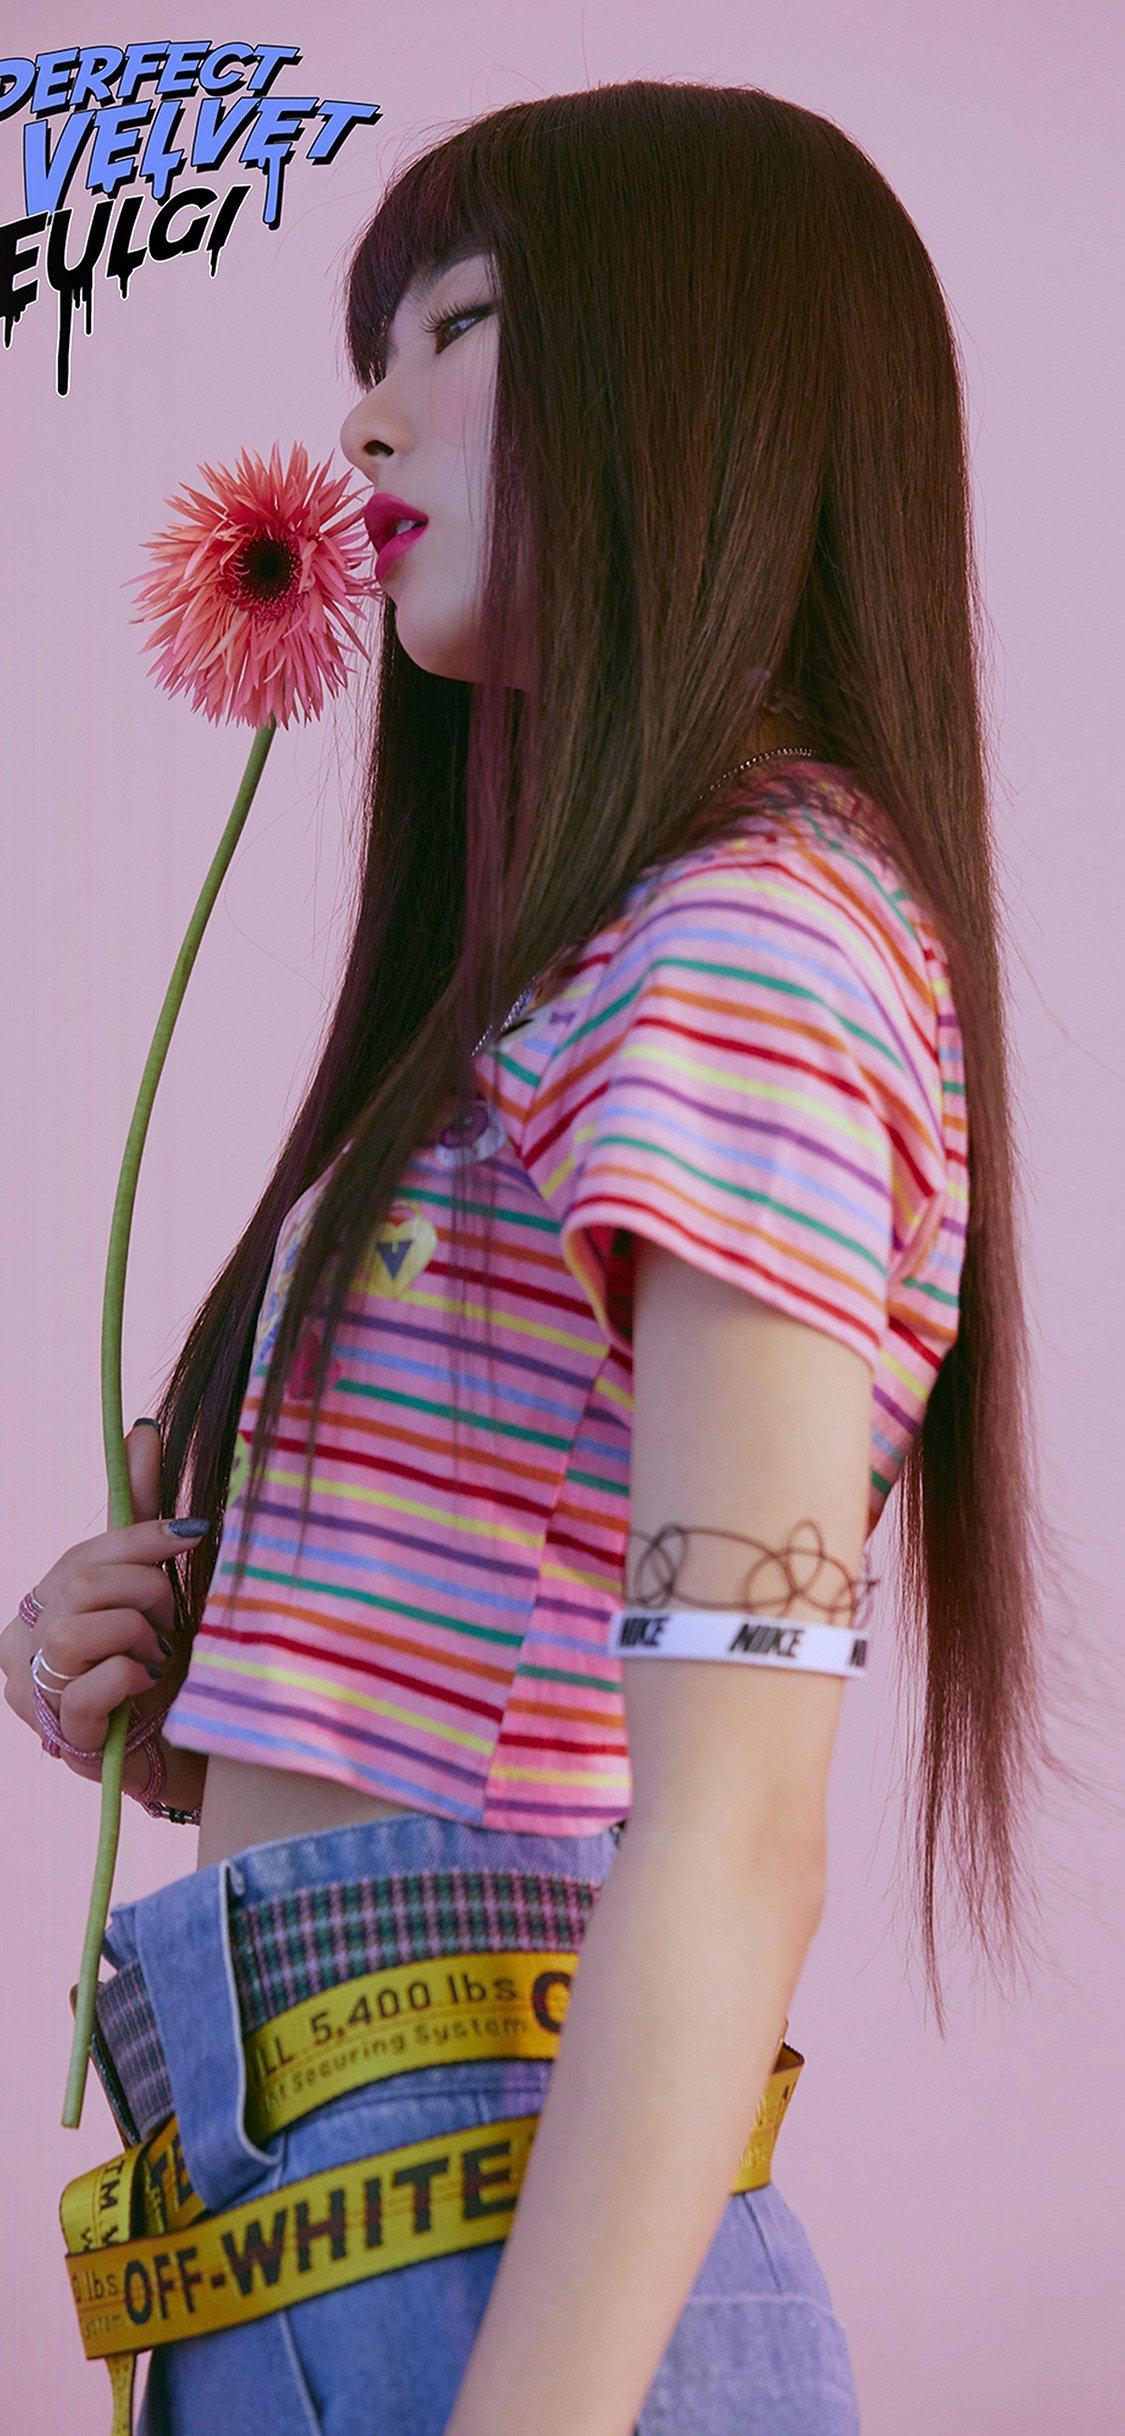 Asian girl iPhone X wallpaper